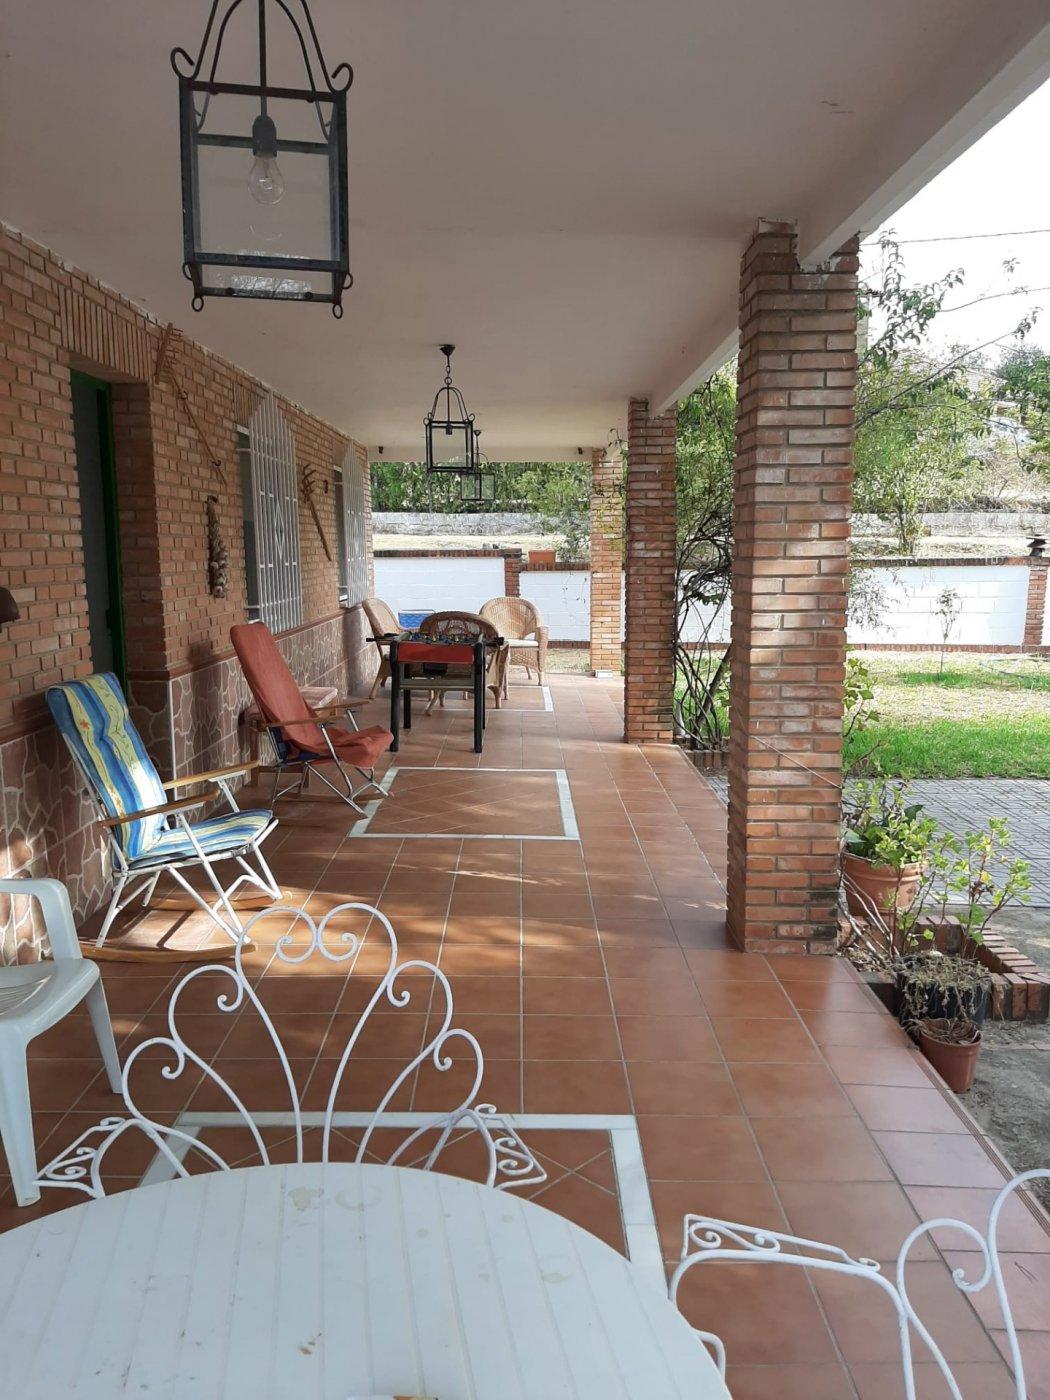 Estupenda casa con piscina propia en zona de assuan- las jaras-cÓrdoba. - imagenInmueble4